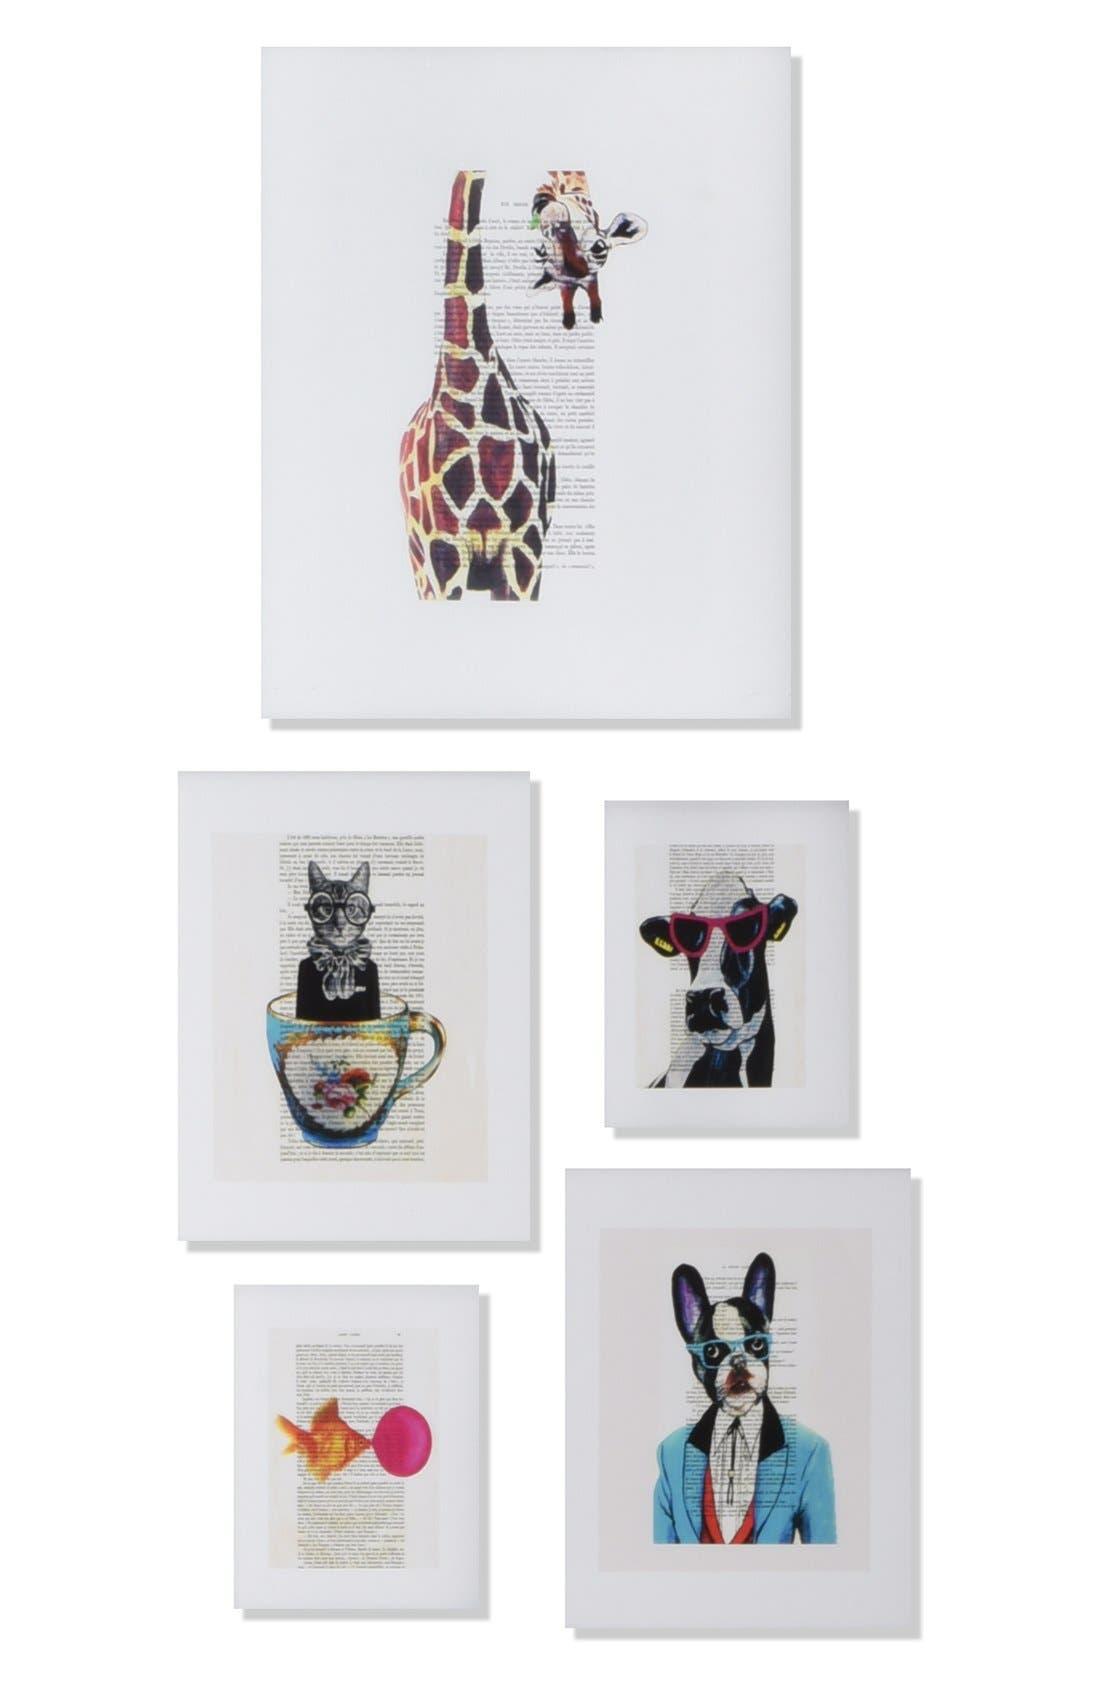 Alternate Image 1 Selected - Deny Designs 'Coco De Paris - Funny' Wall Art Gallery (Set of 5)